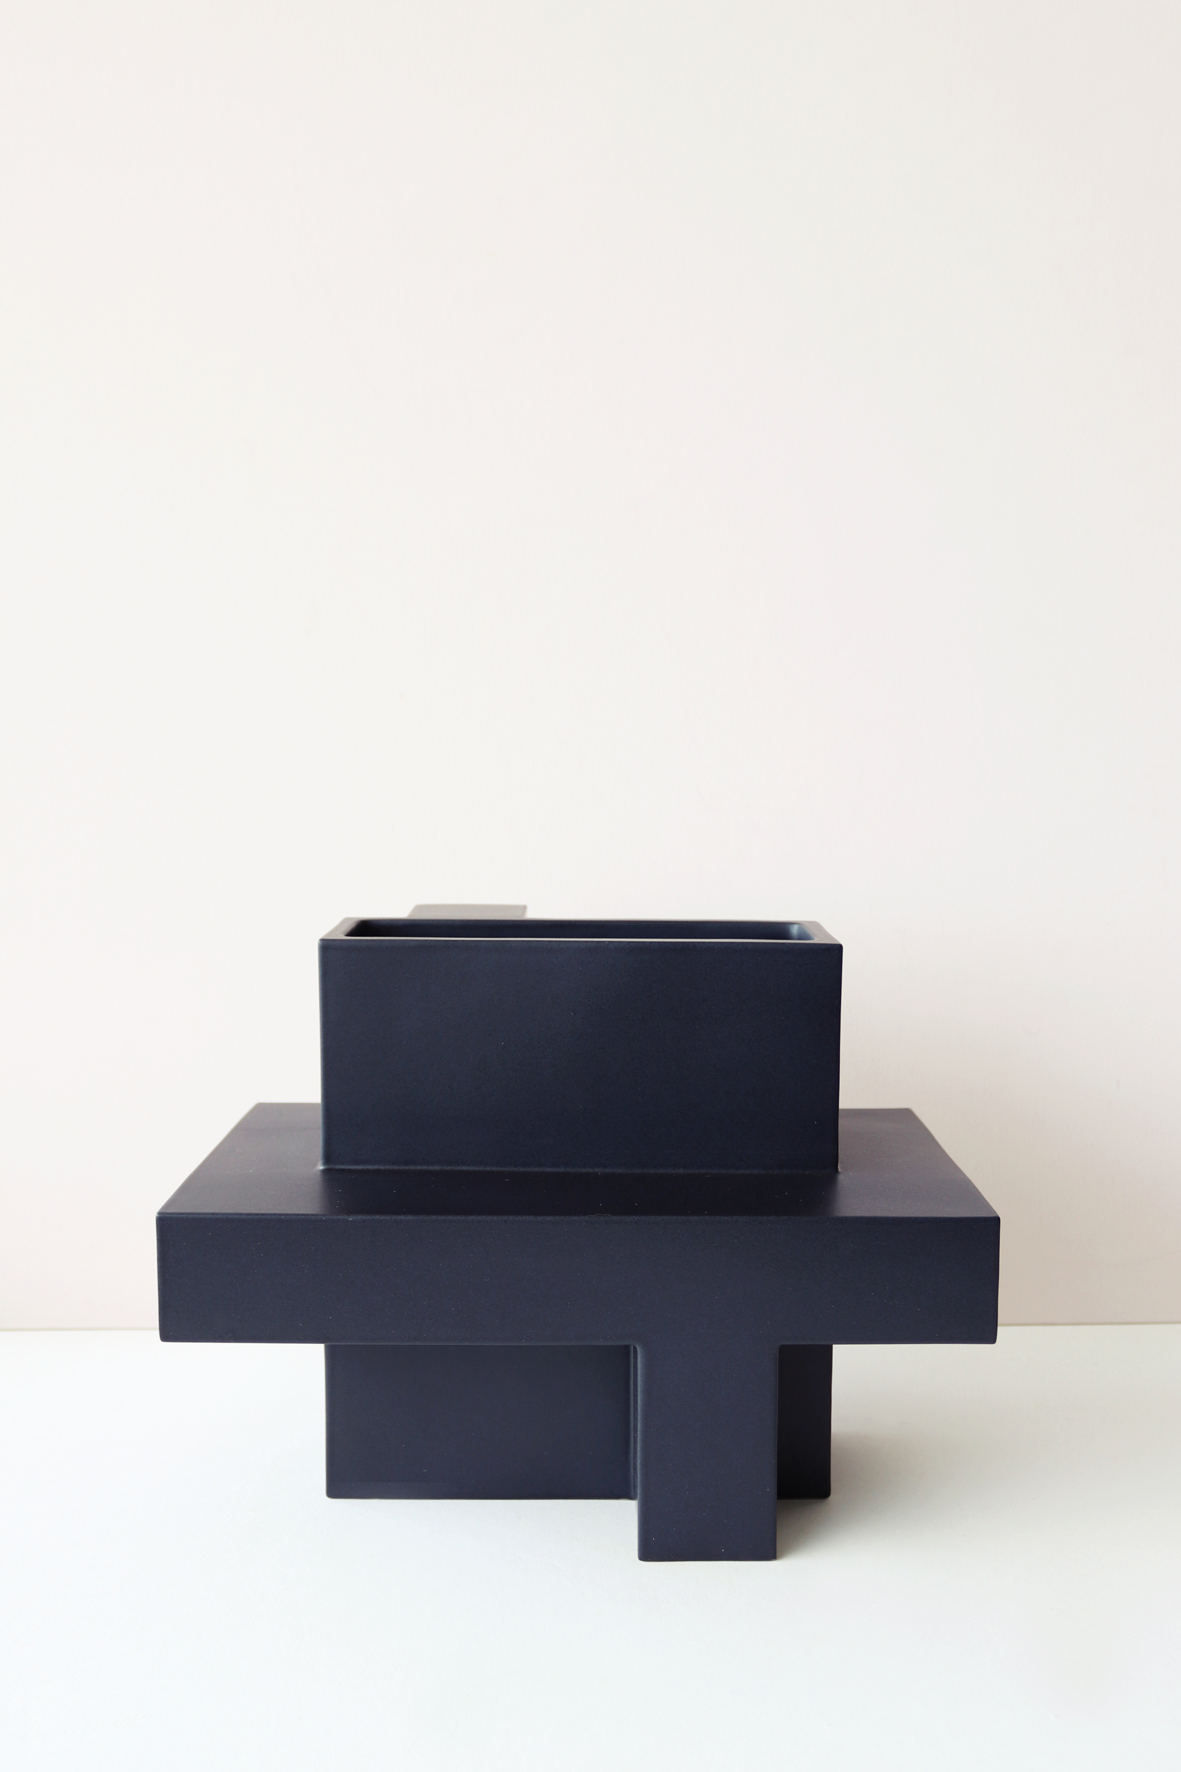 vase-object#37